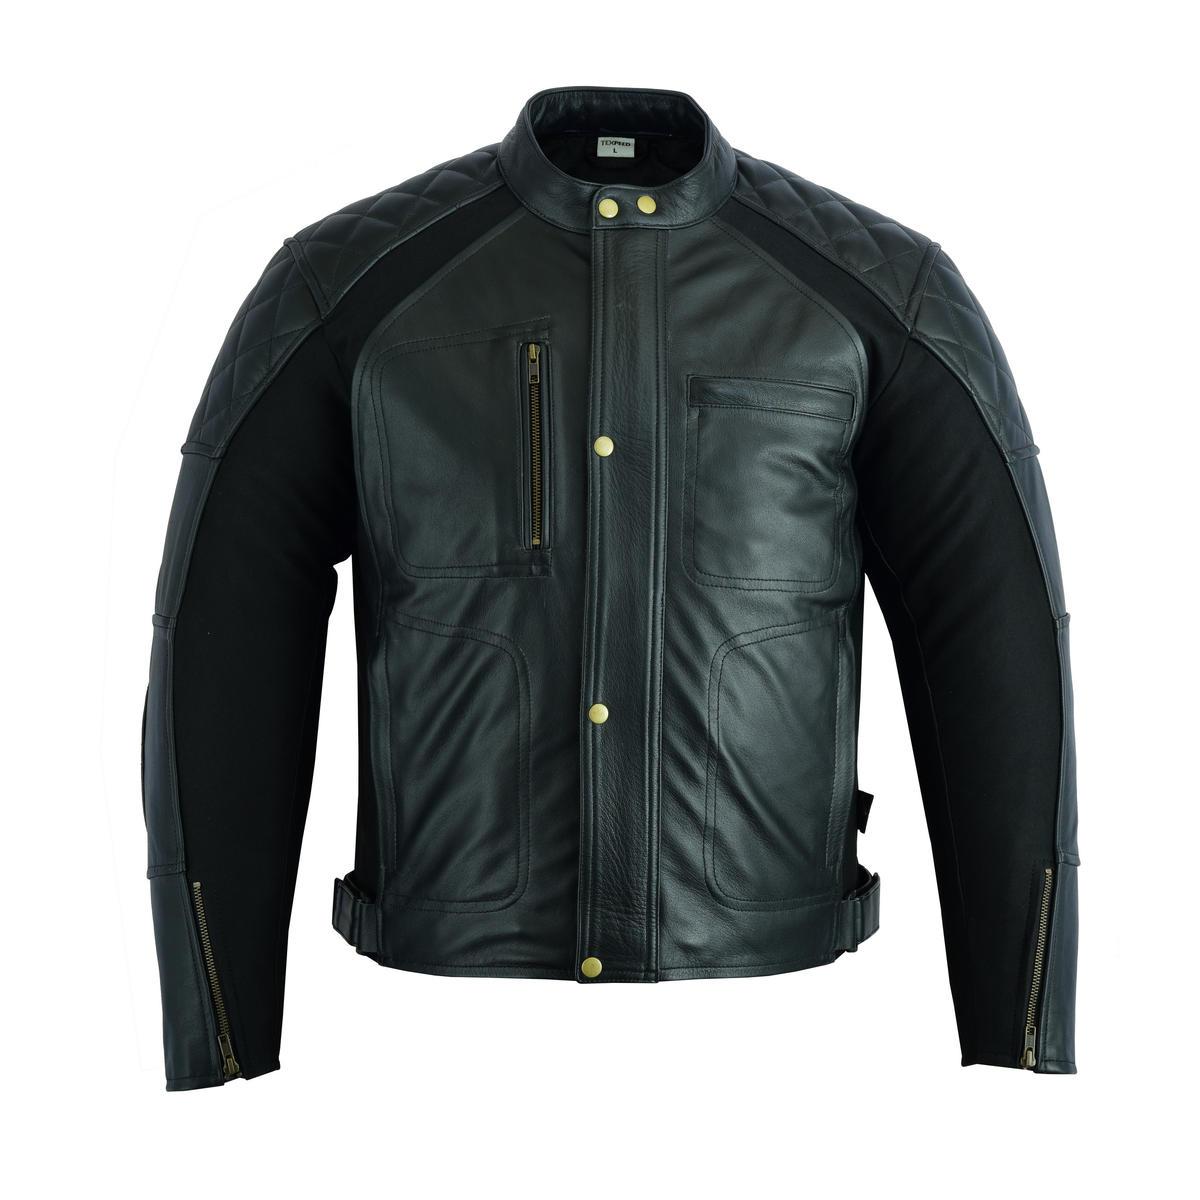 LJ-DIA-STR-BK (Clearance Stretch Arm Leather Jacket)